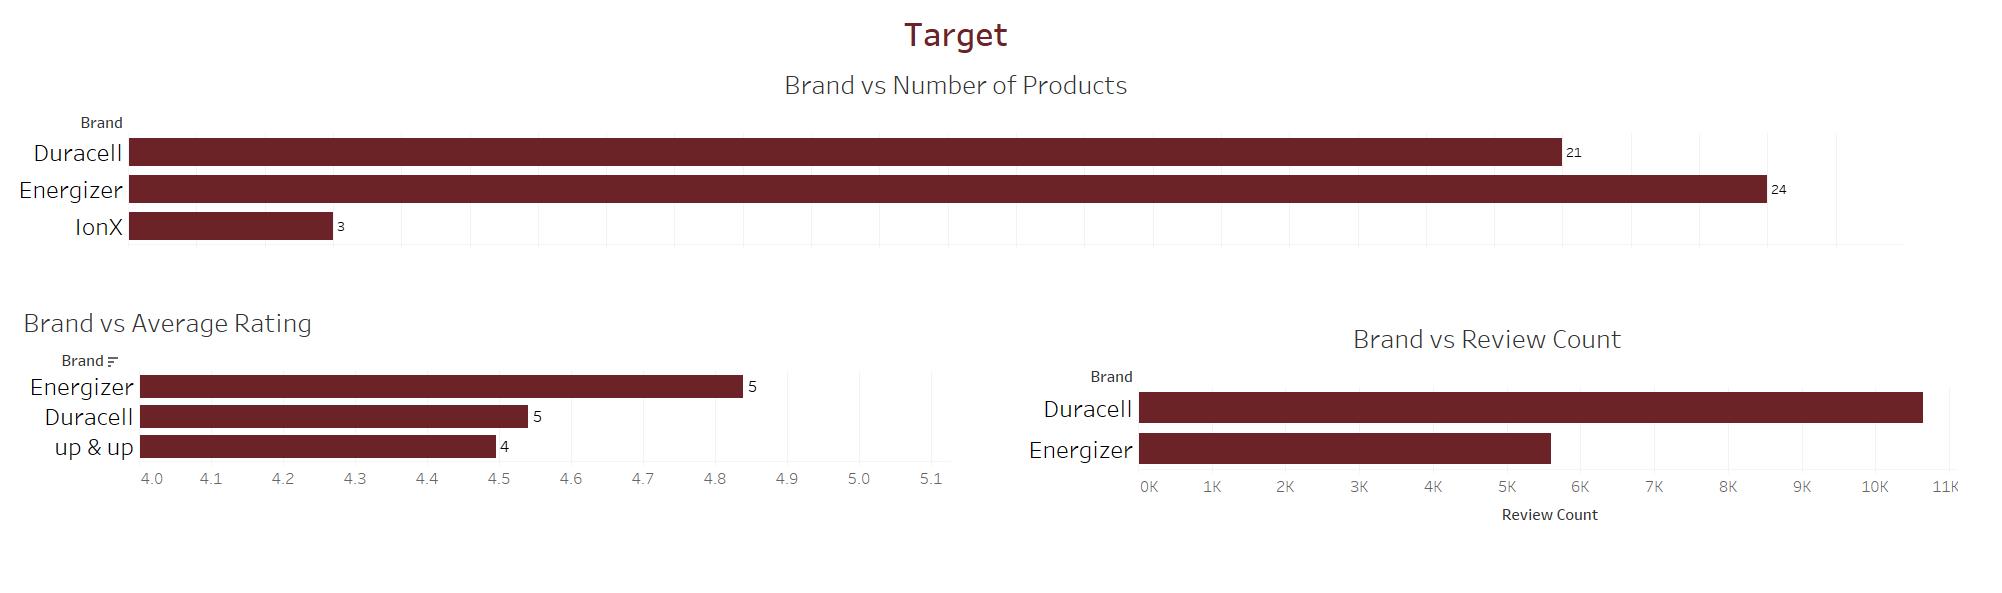 ecommerce-data-visualization-using-tableau